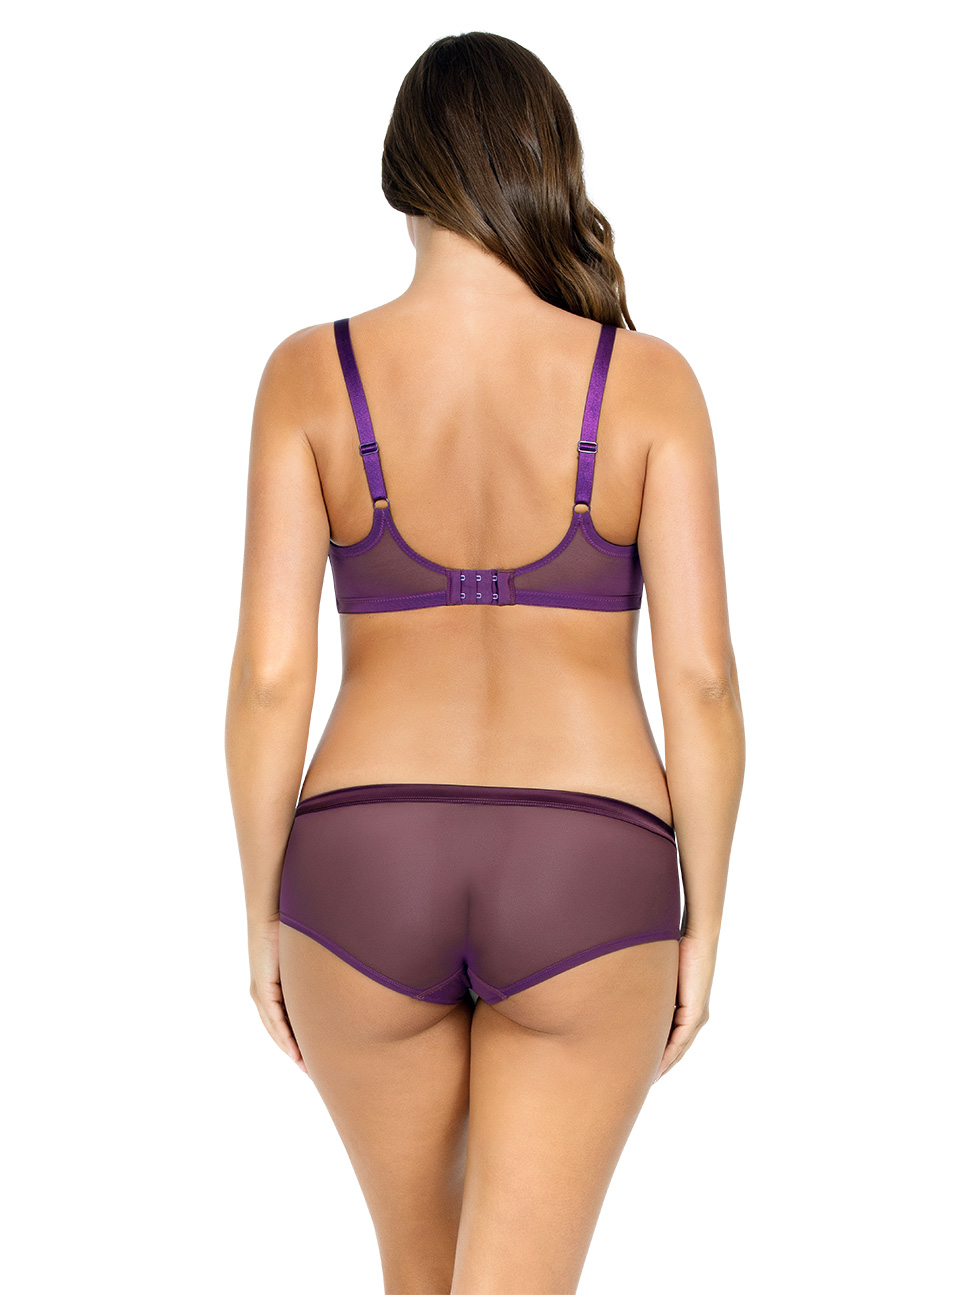 PARFAIT Lulu UnderwireBraP5612 HipsterP5615 Grape Back1 - Lulu Hipster - Grape - P5615